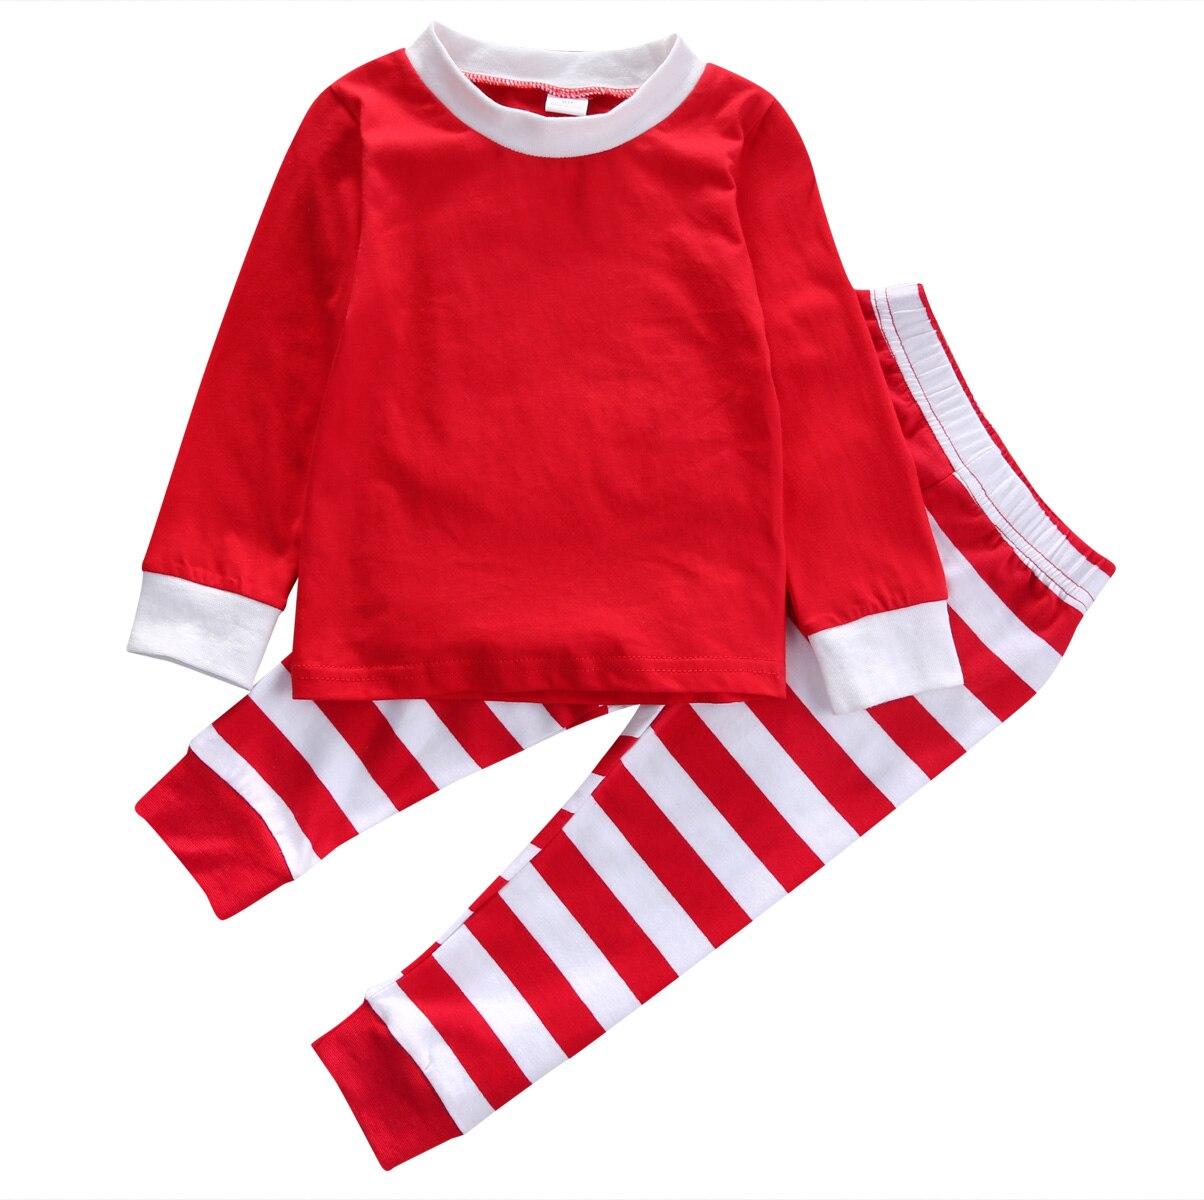 2pcs Toddler Kids Baby Boy Girls Striped Outfits Christmas Pajamas Sleepwear  Set kigurumis Children s Pajamas nightwear 2016 New 2d99cbc6d